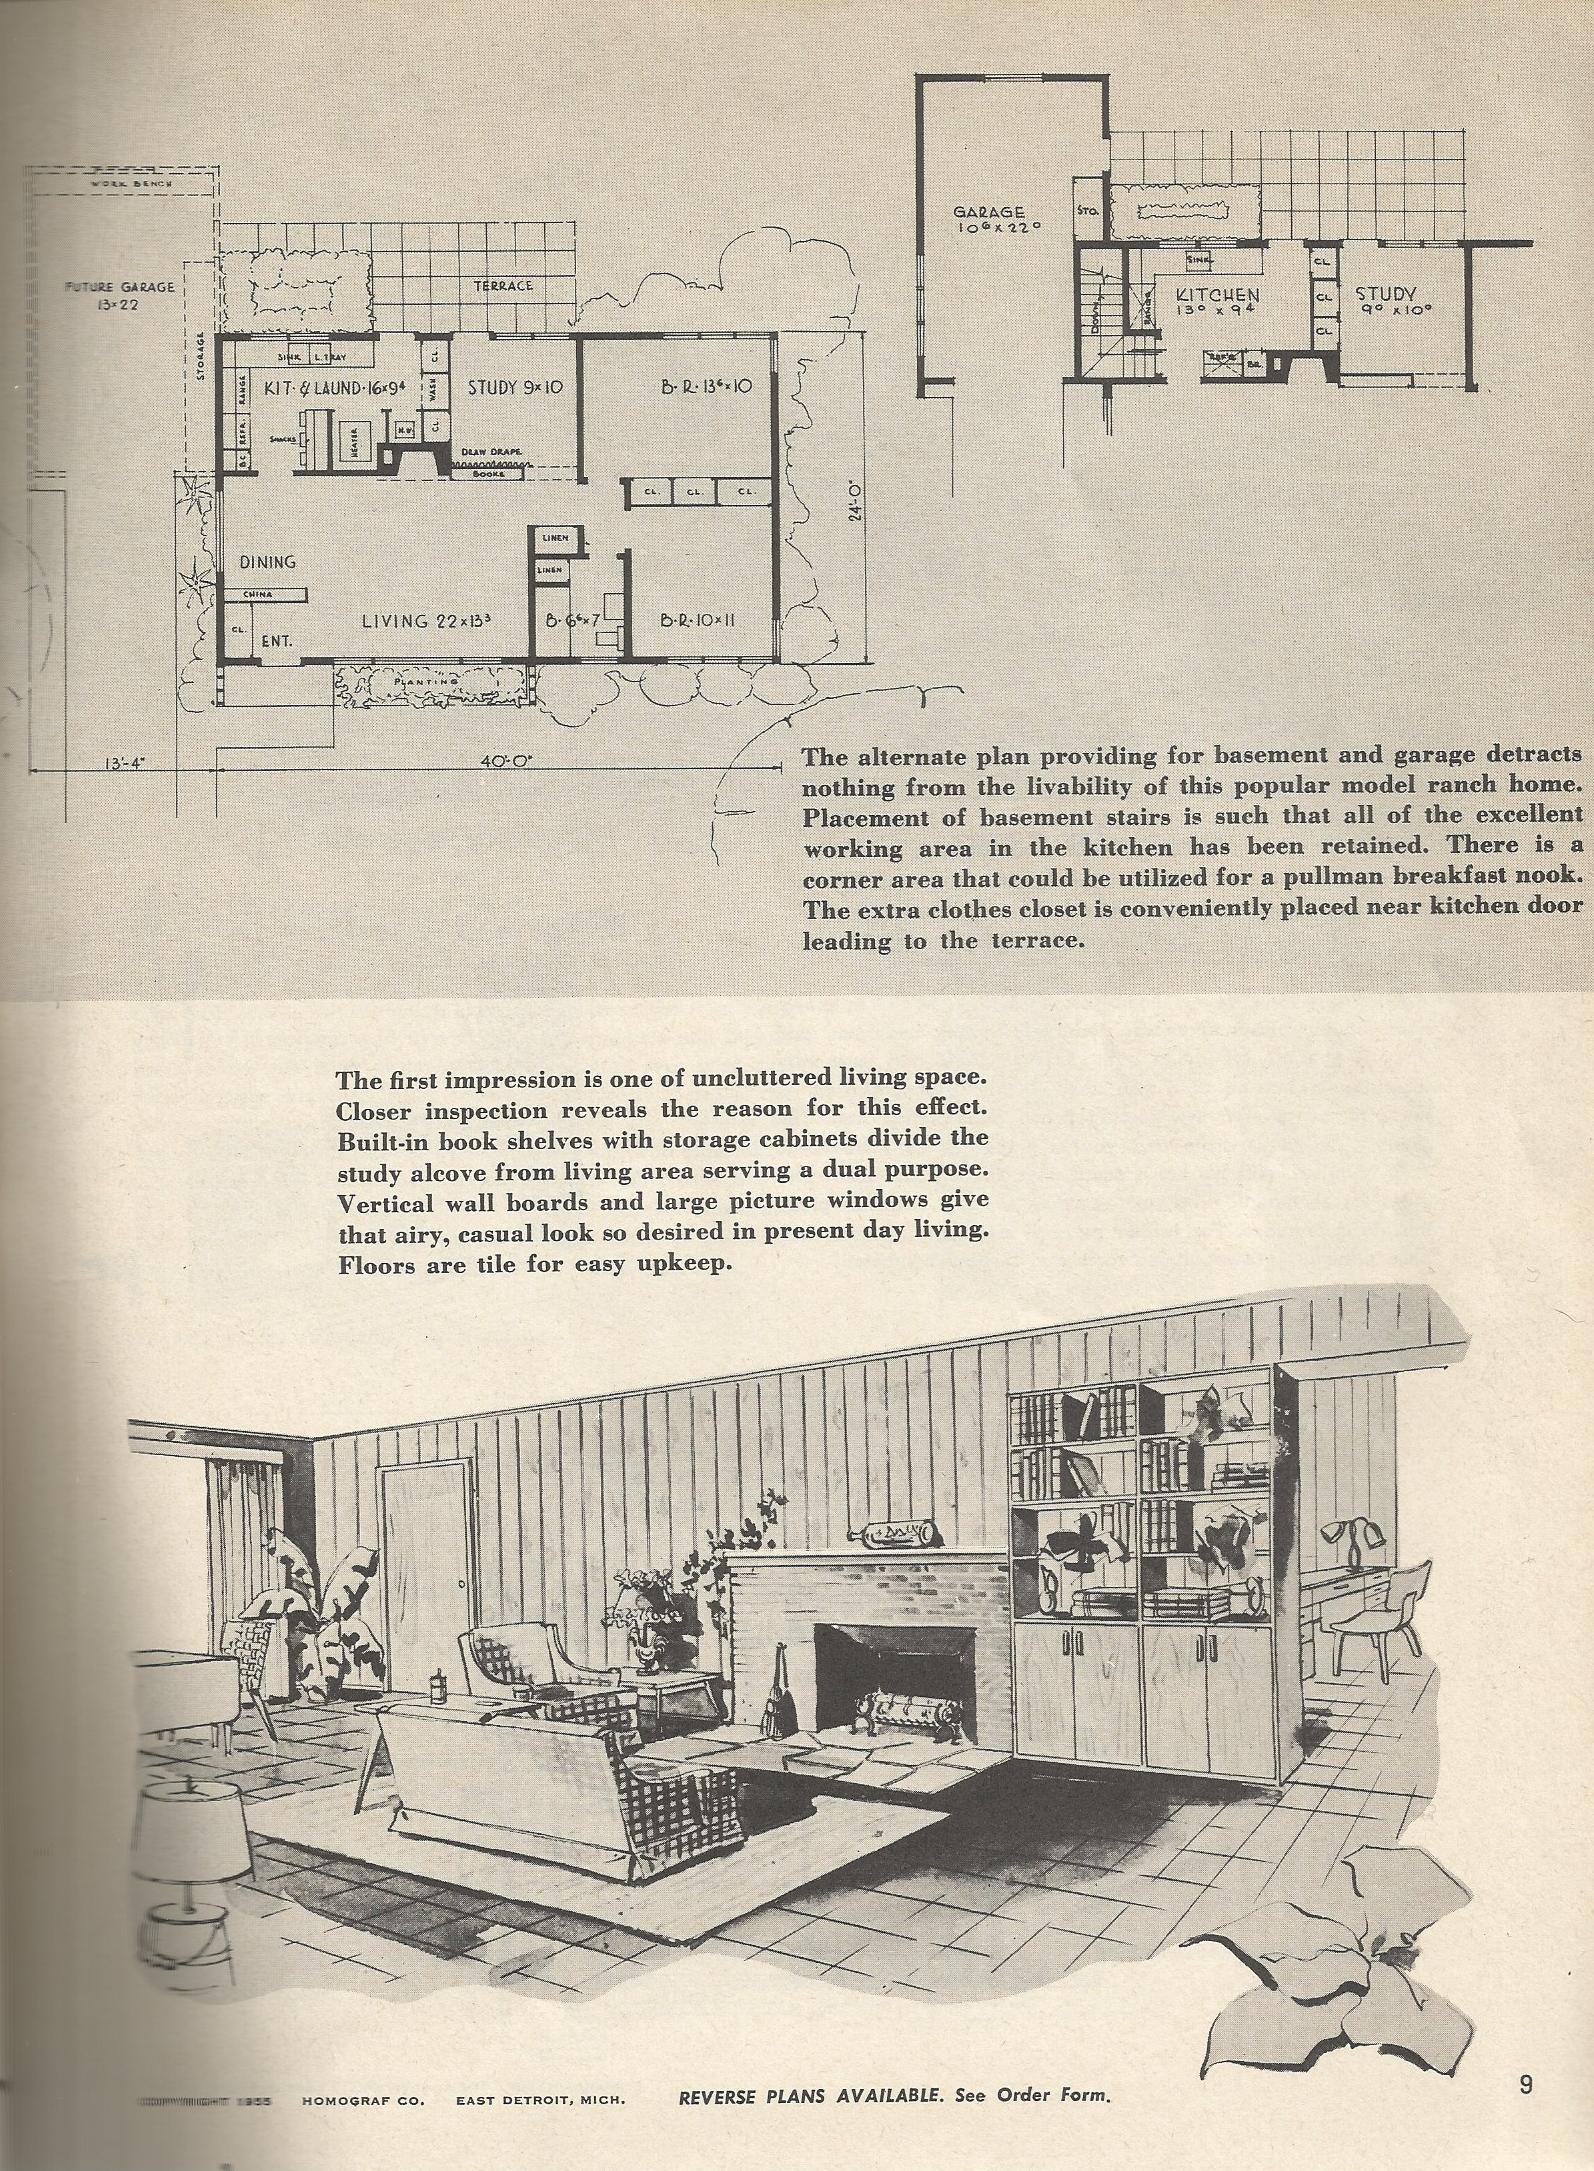 Vintage house plans 7ka antique alter ego for Retro home designs